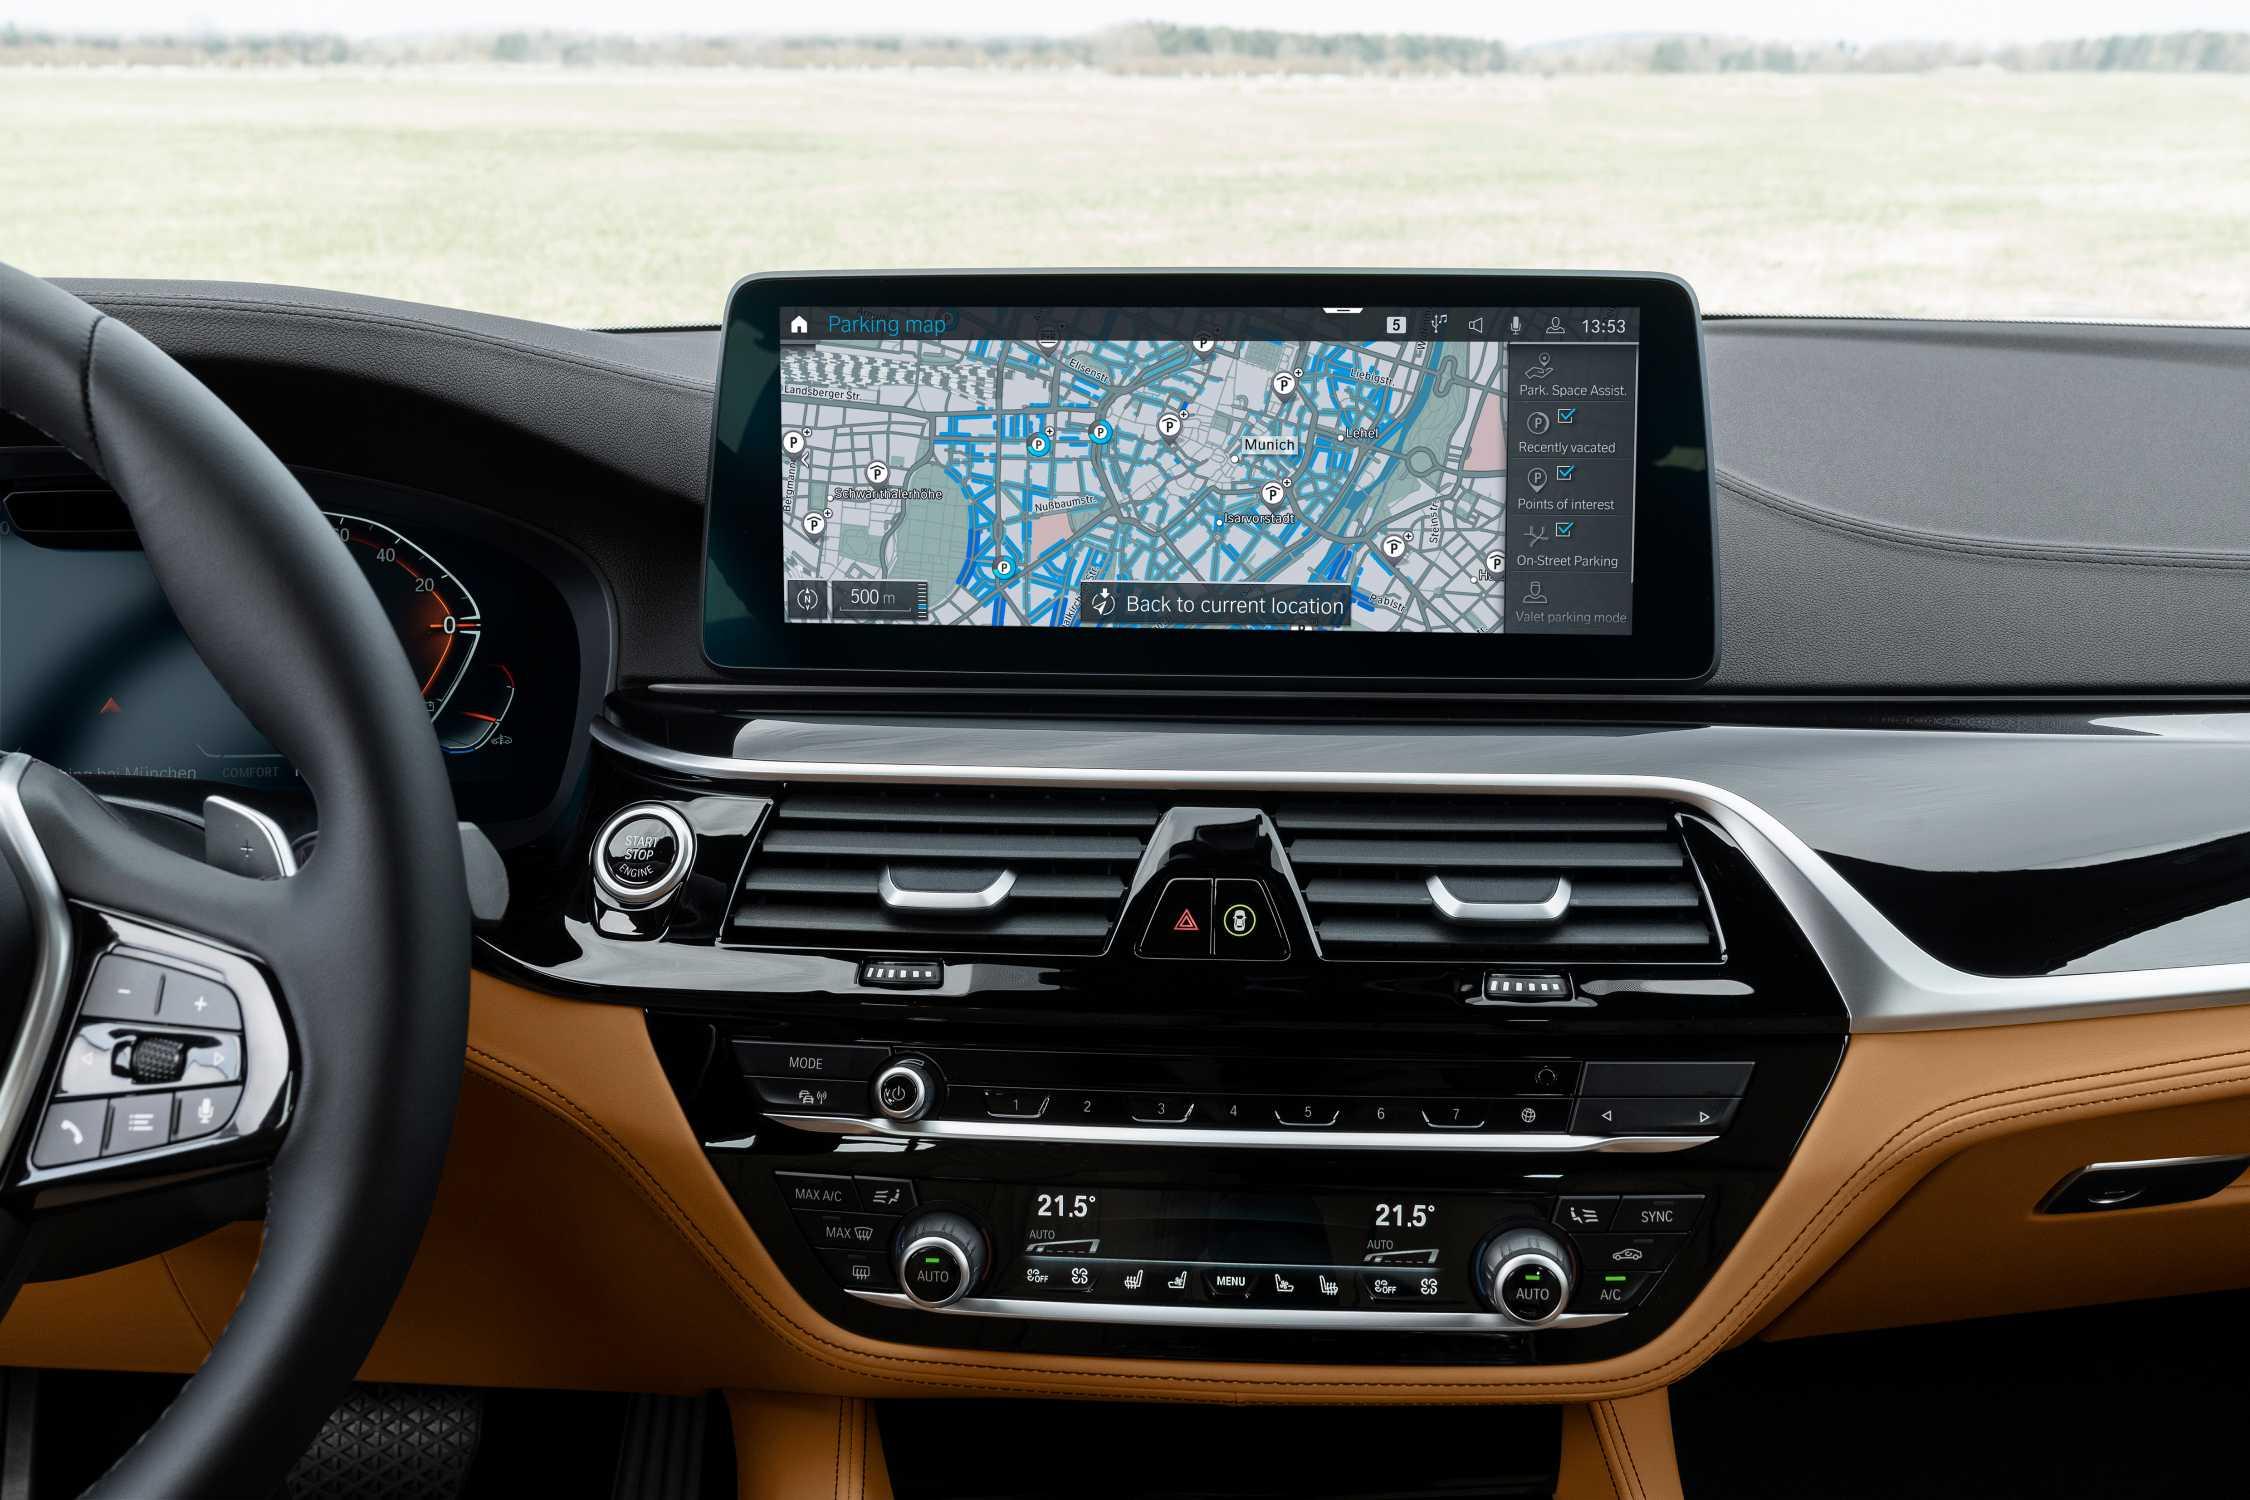 BMW Maps - On-Street-Parking-Information. (07/20)